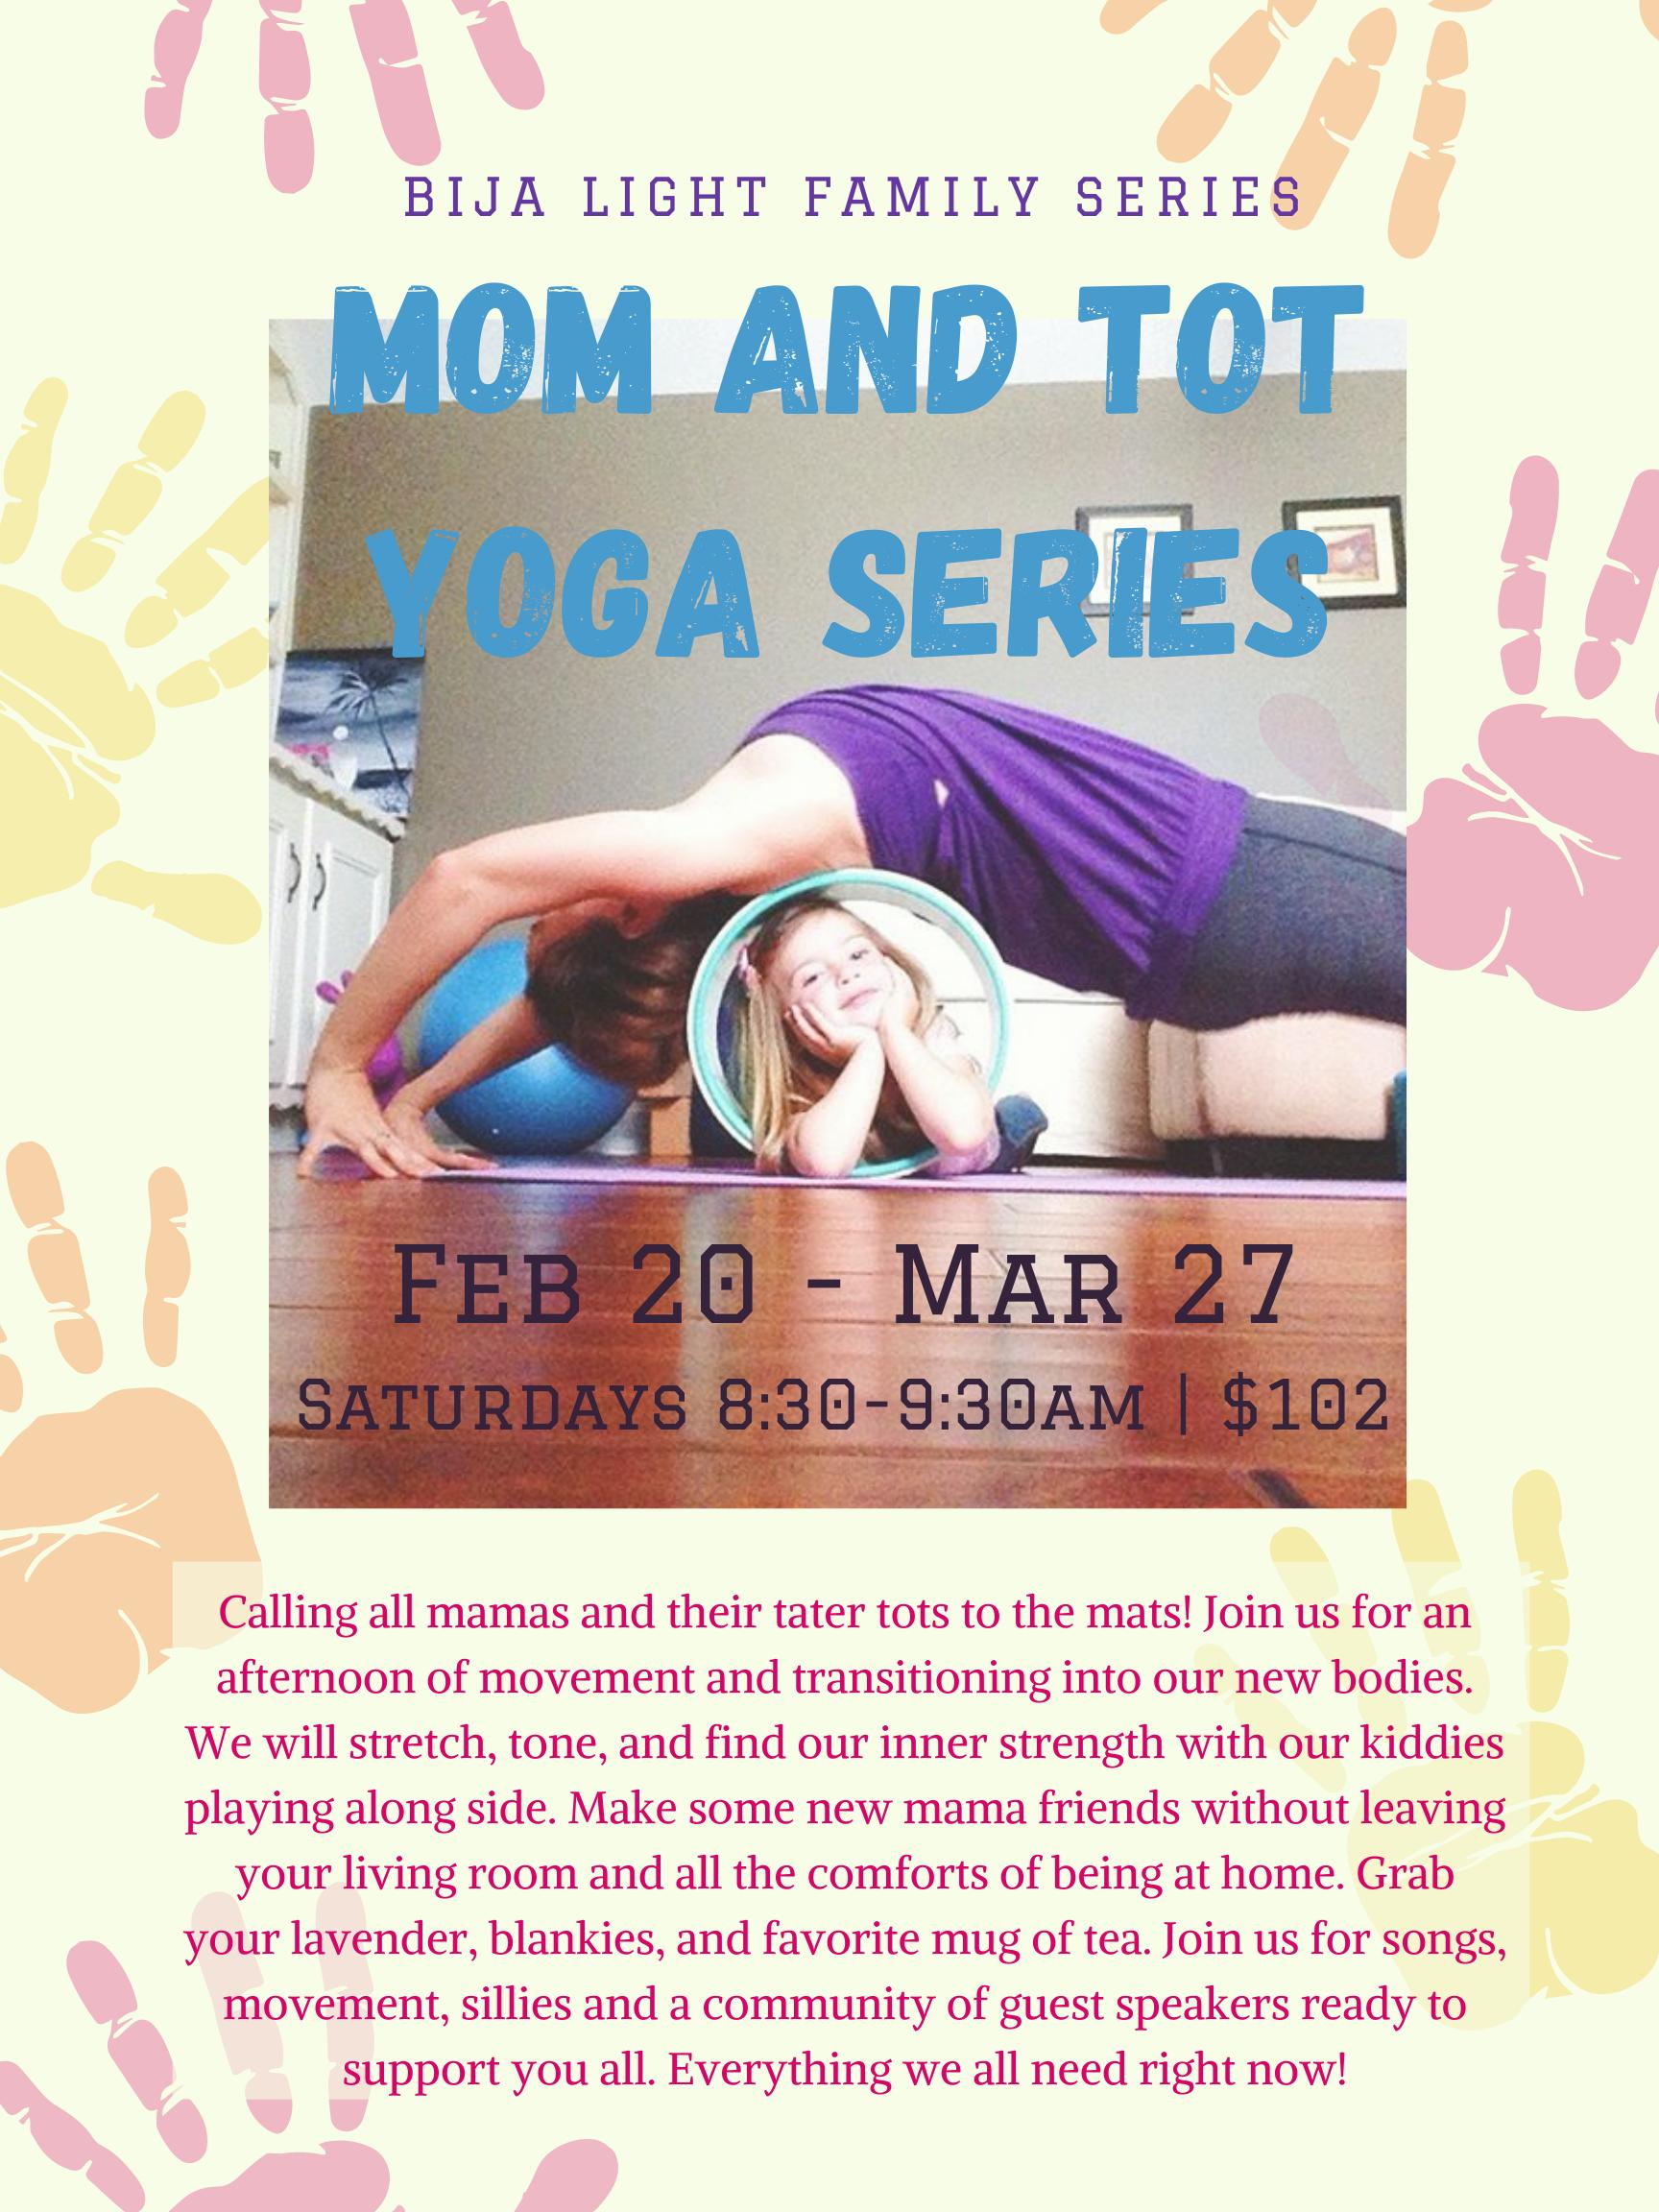 mom-and-tot-yoga-series